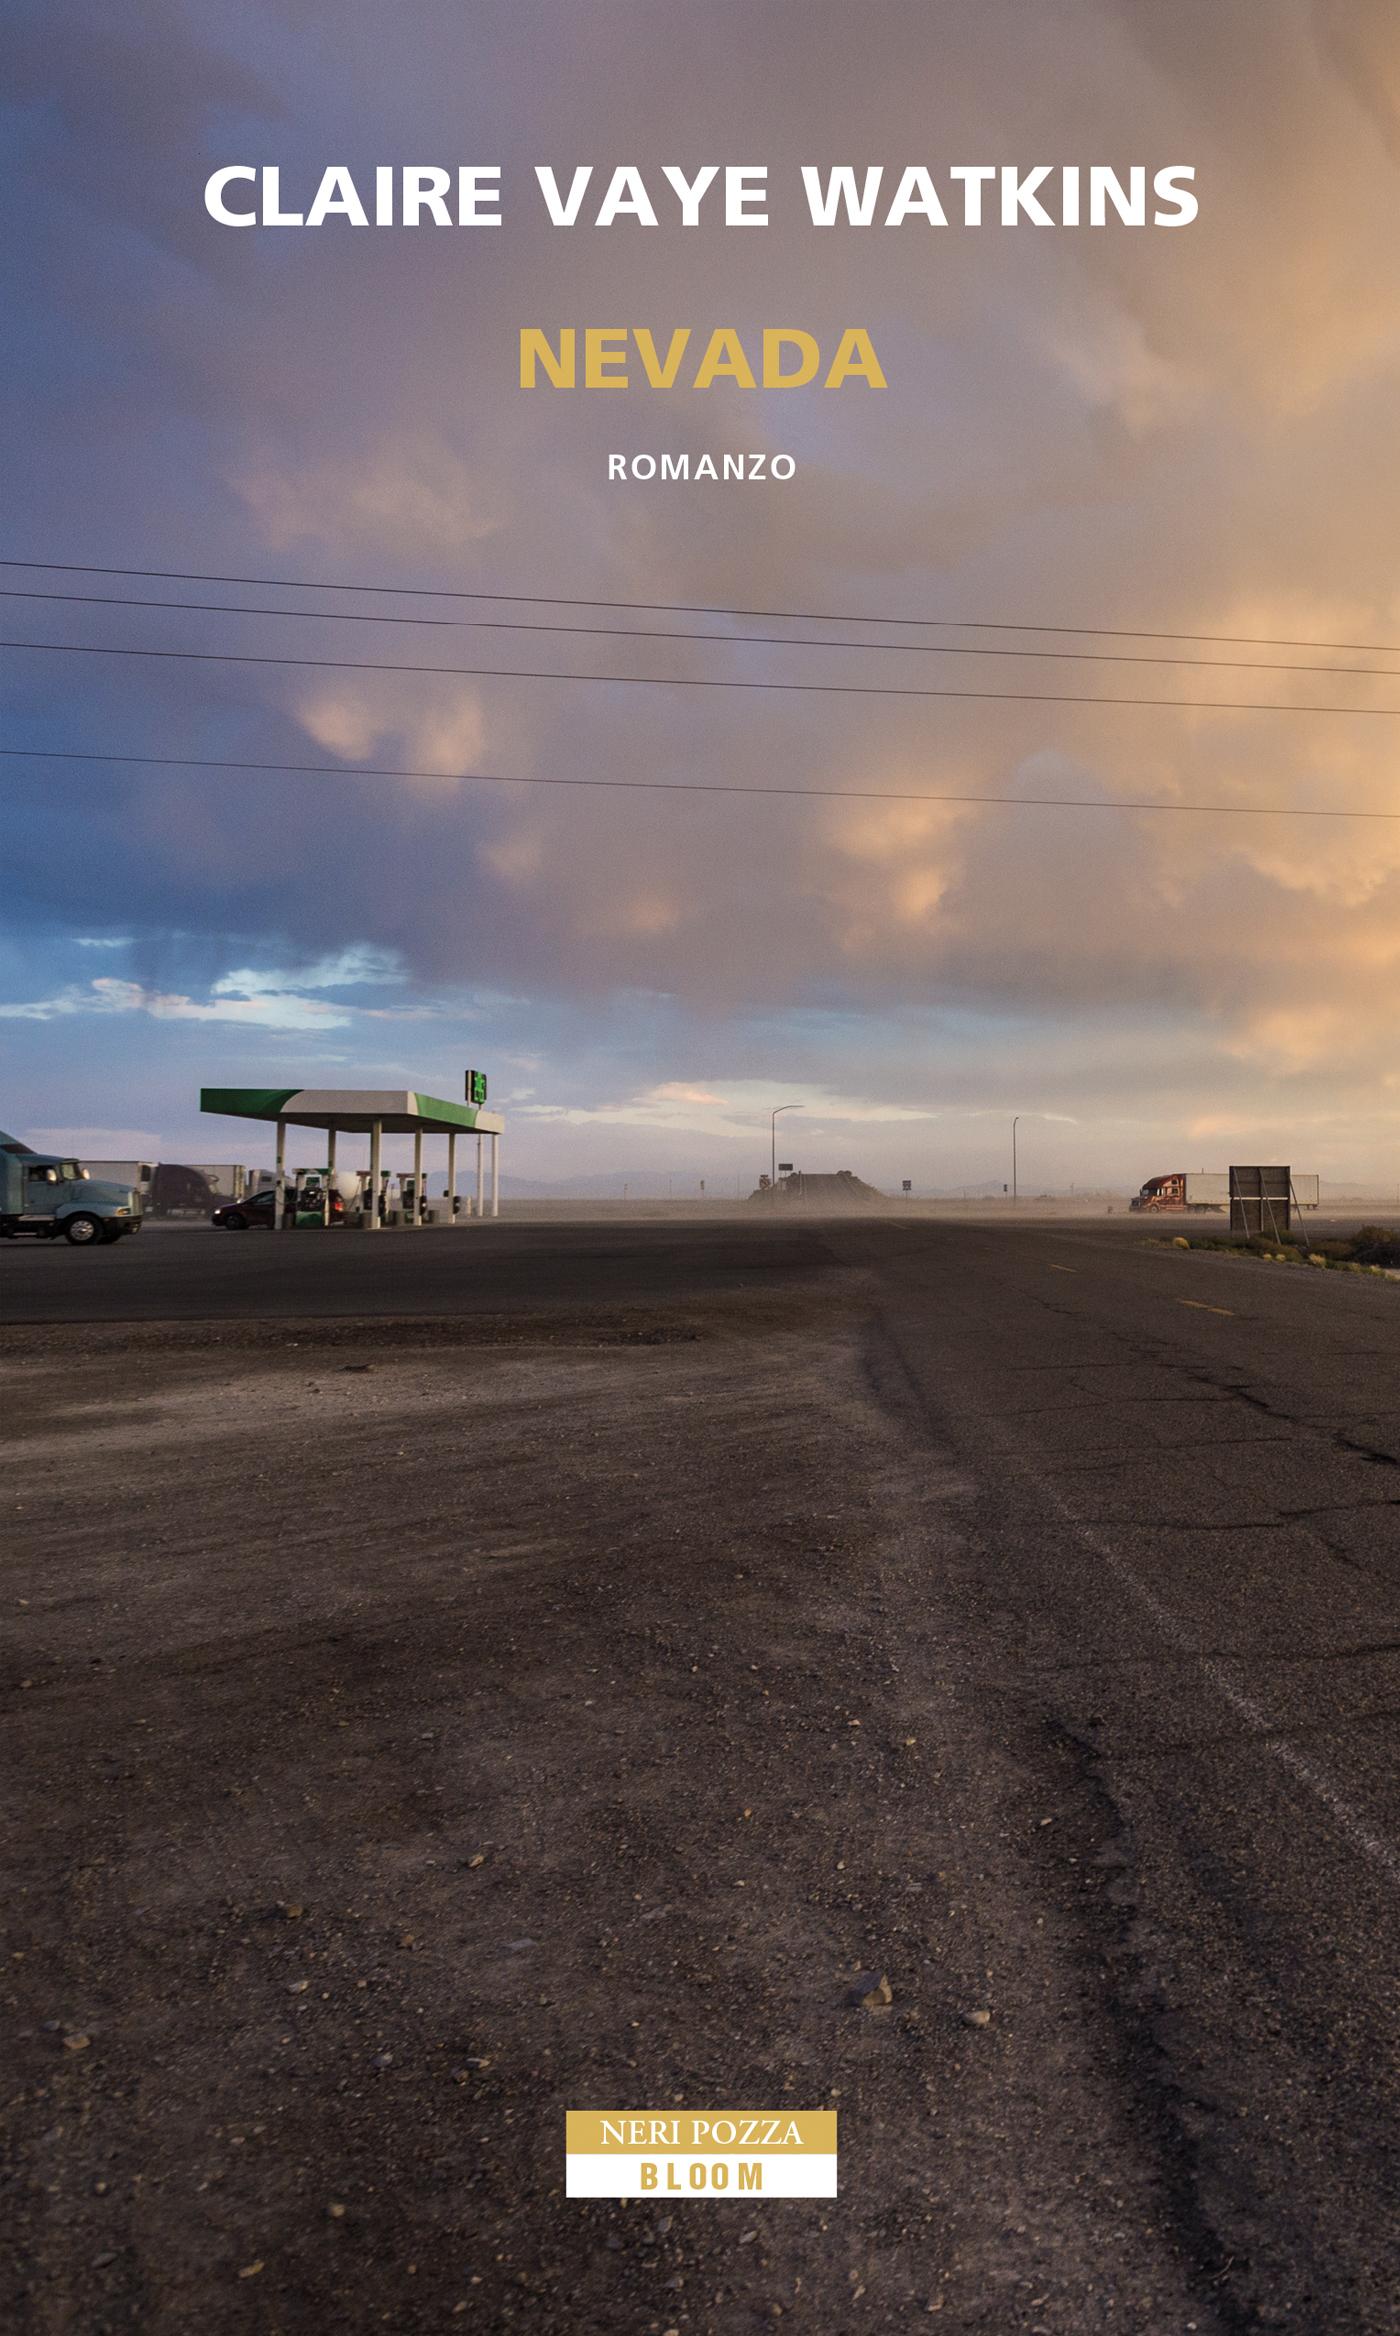 Watkins Nevada